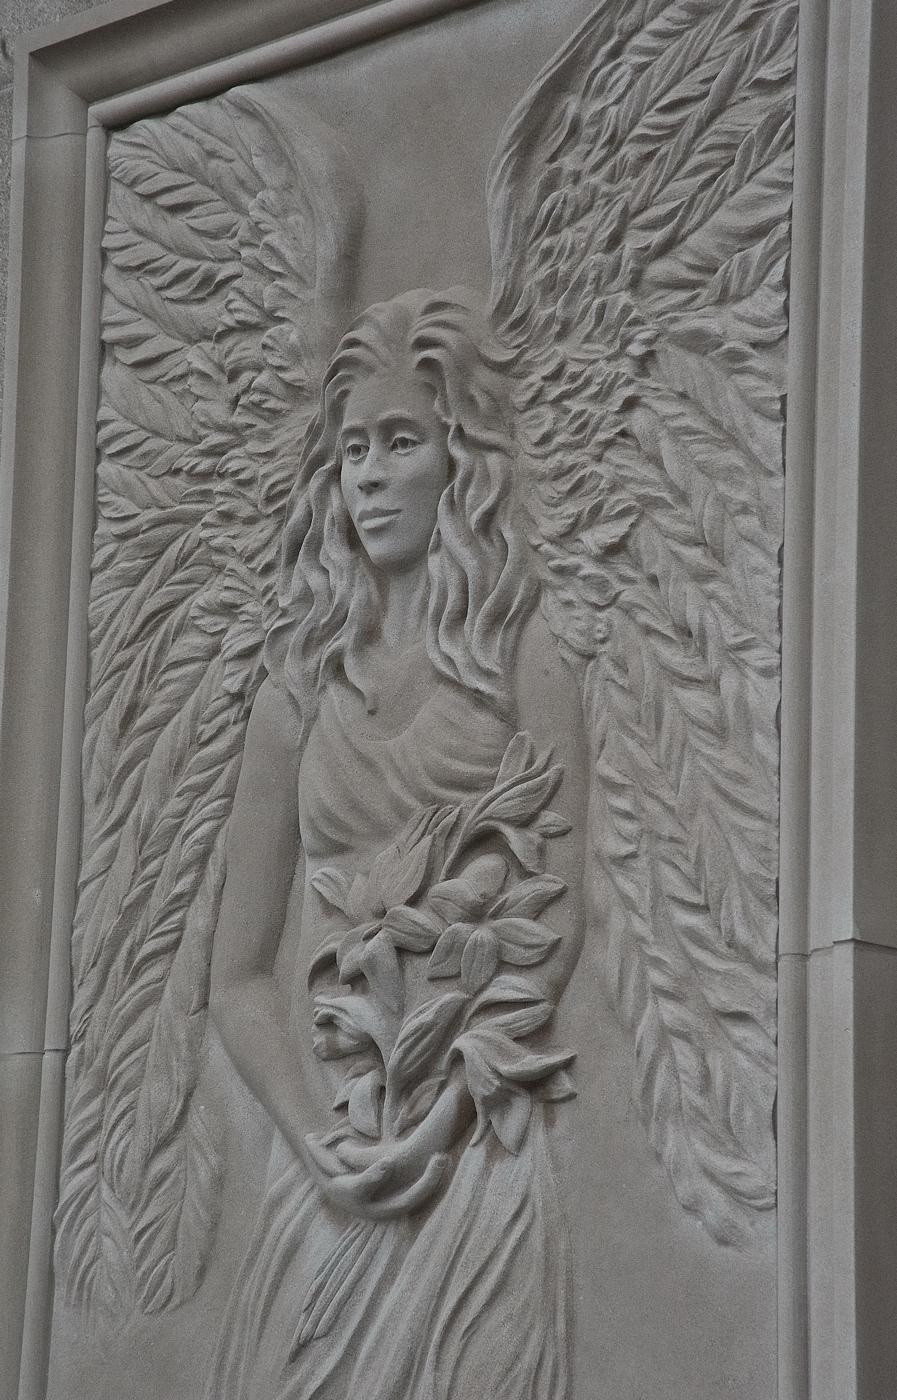 Vivaldi's Angels- Chapel of Angels- Sunset Hills Mausoleum